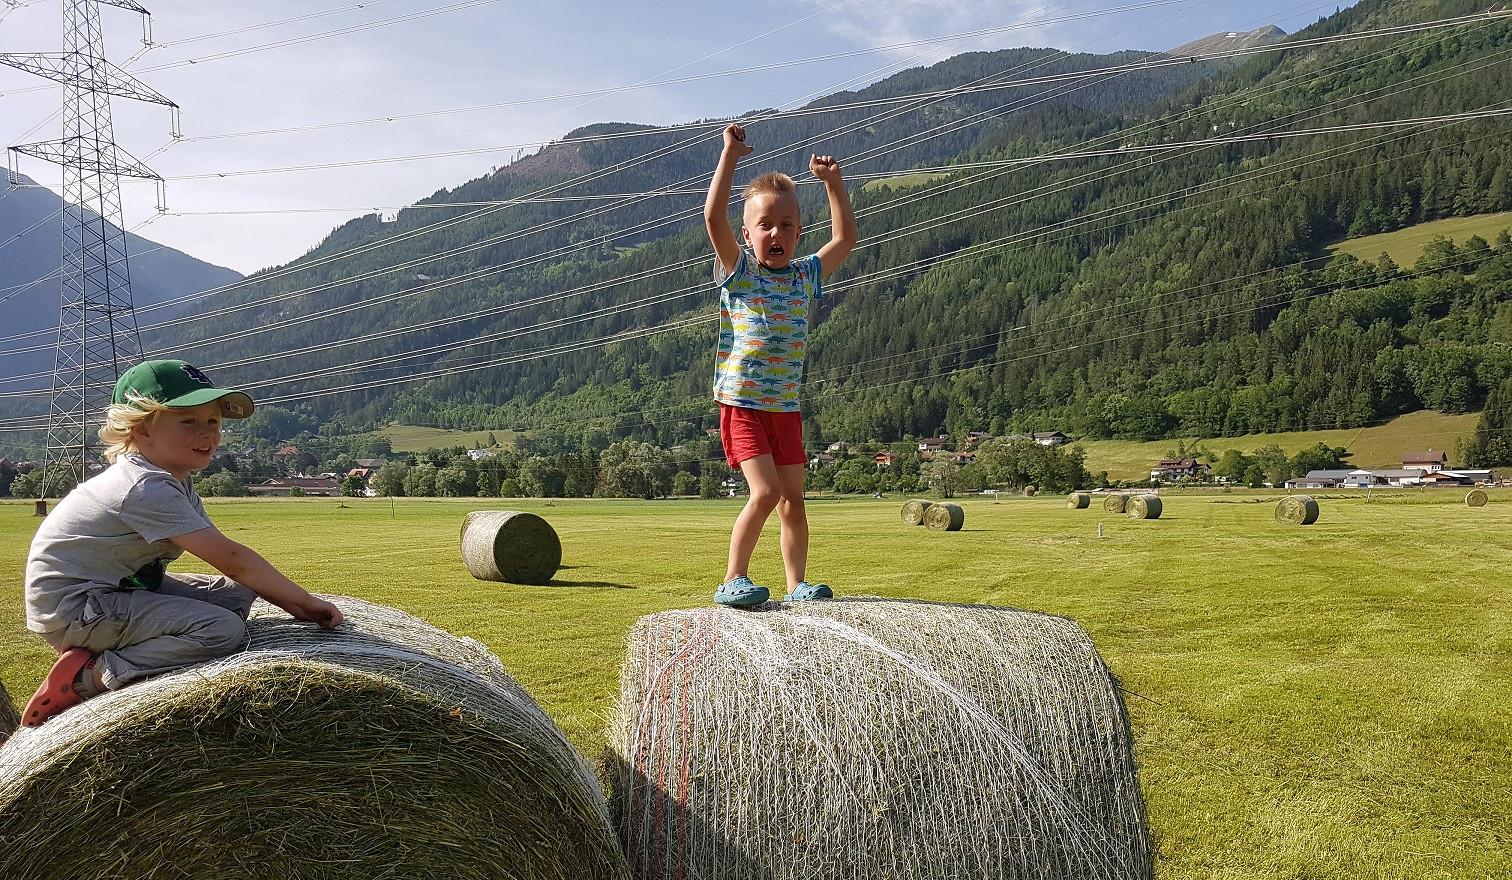 Urlaub mit Kindern.jpg